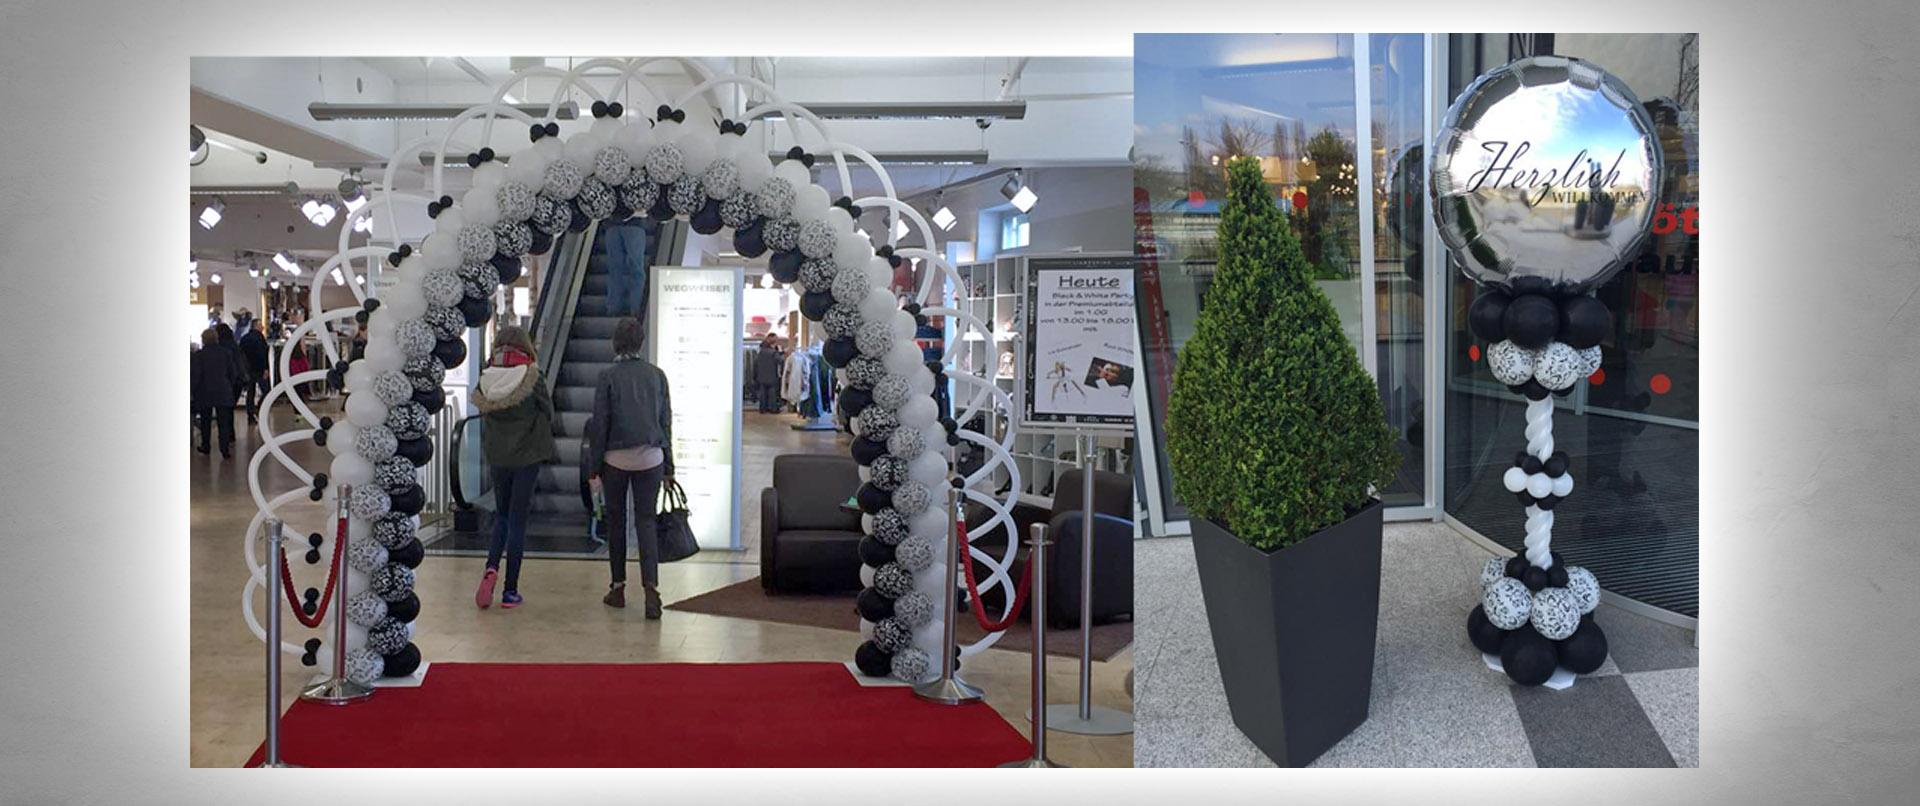 Luftballon-Dekoration Eröffnung Premiumabteilung Modehaus Gebrüder Götz Würzburg